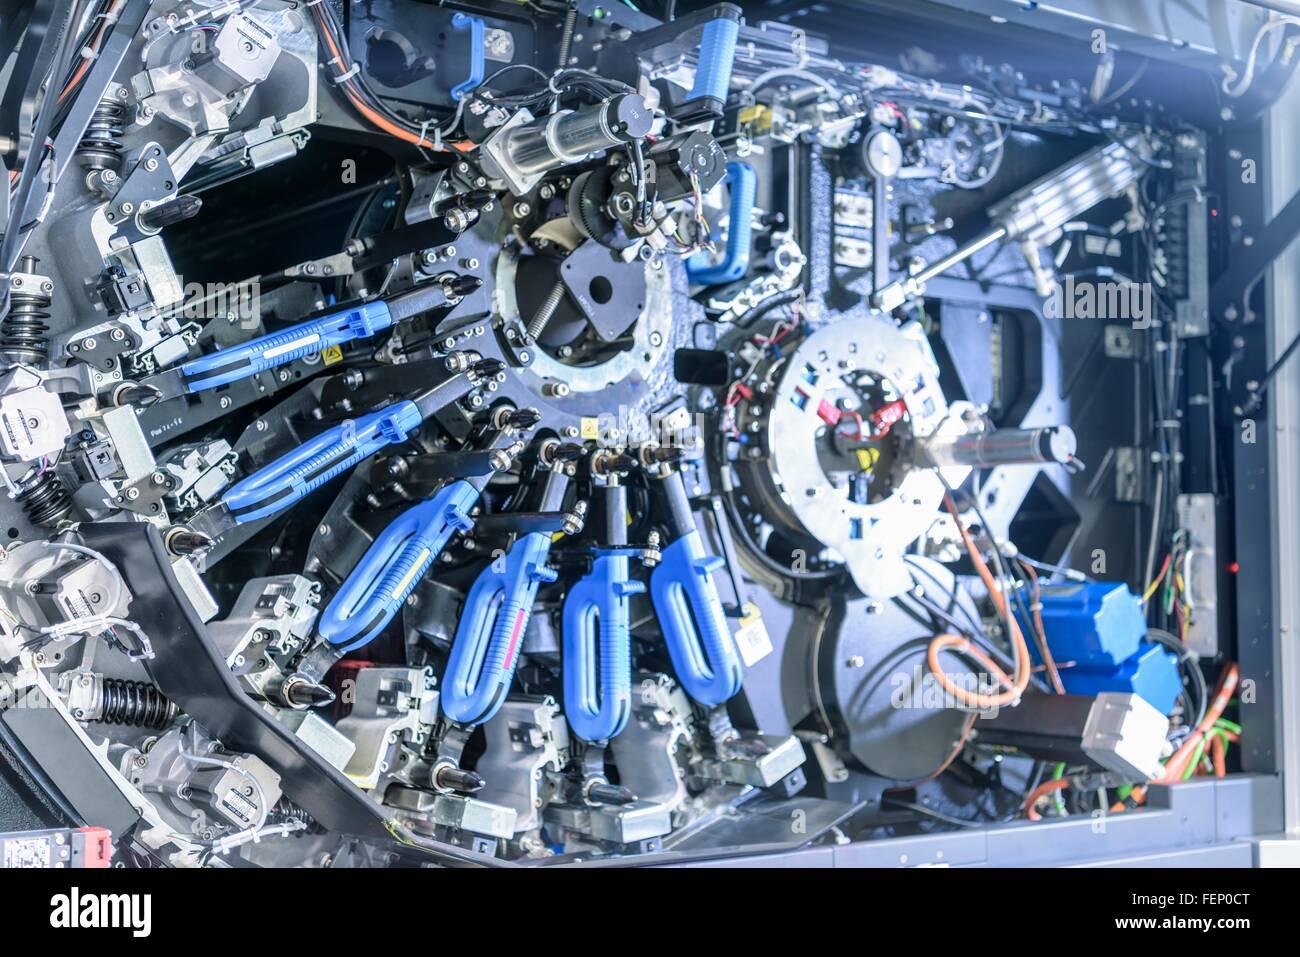 Detail of ink jet printer in food packaging printing factory Stock Photo